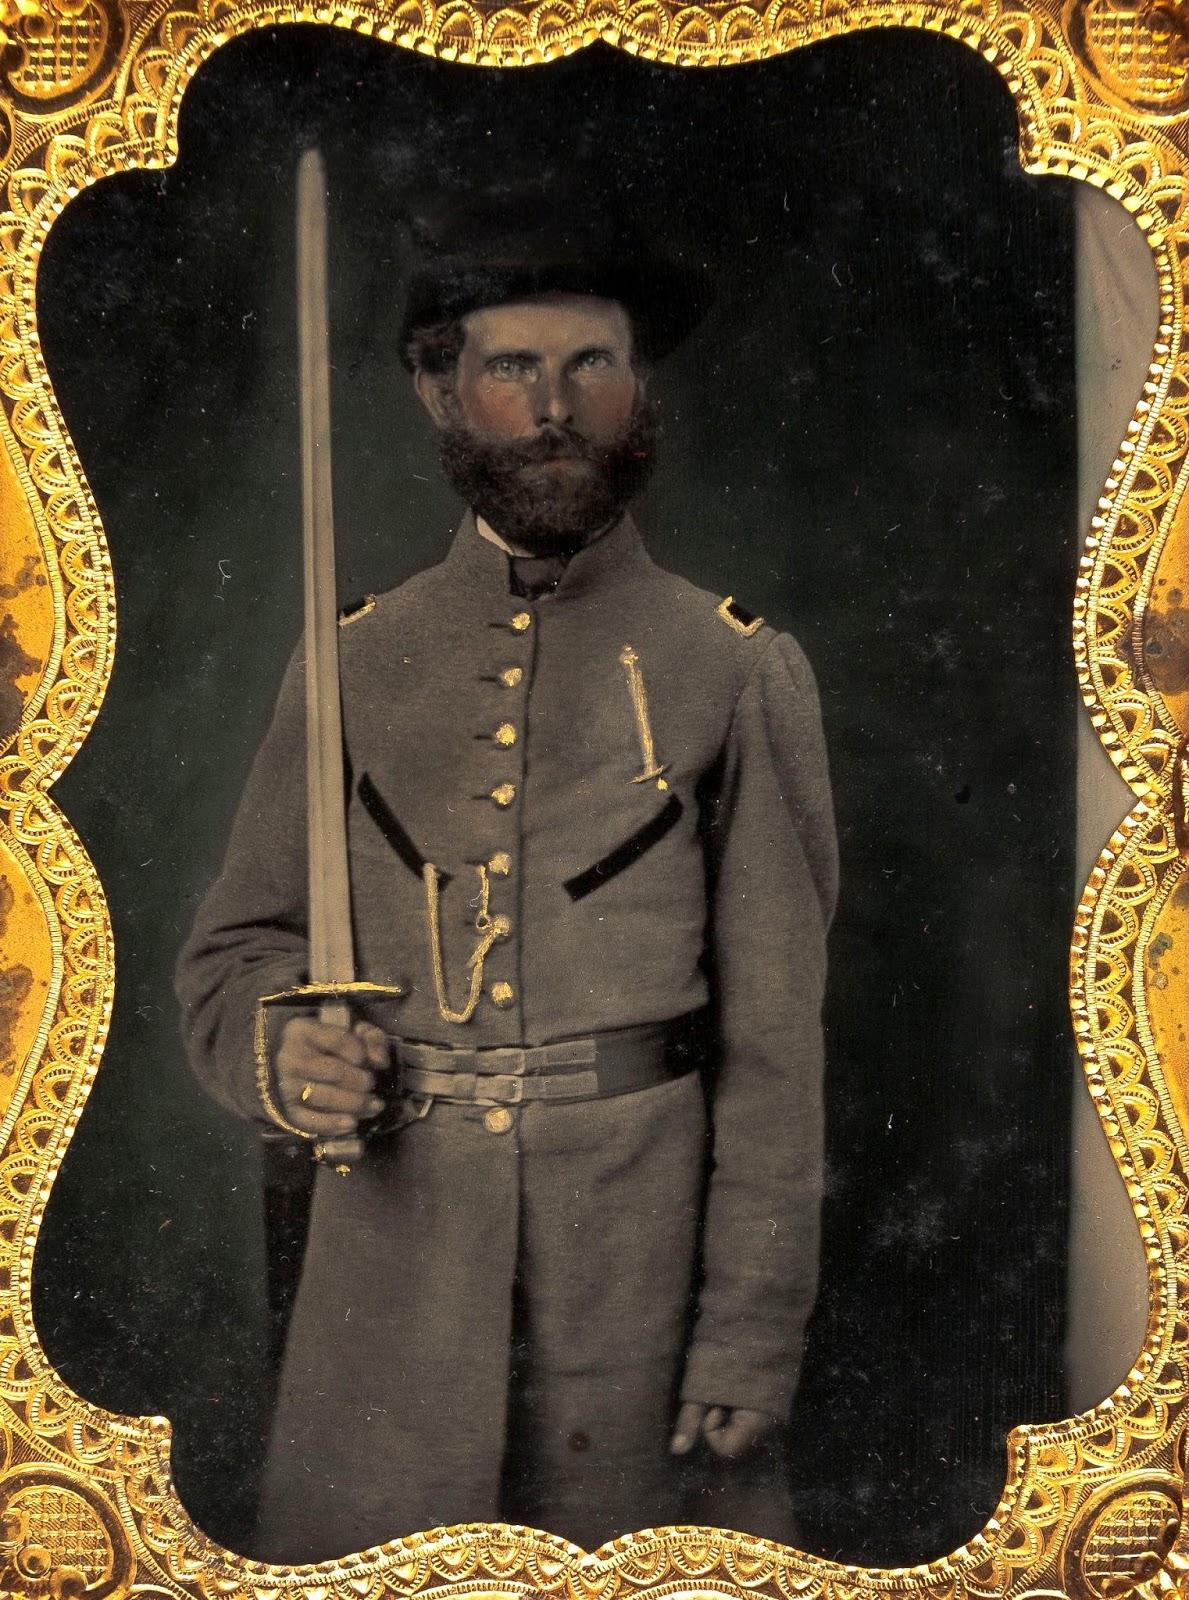 tintype confederate officer.jpg